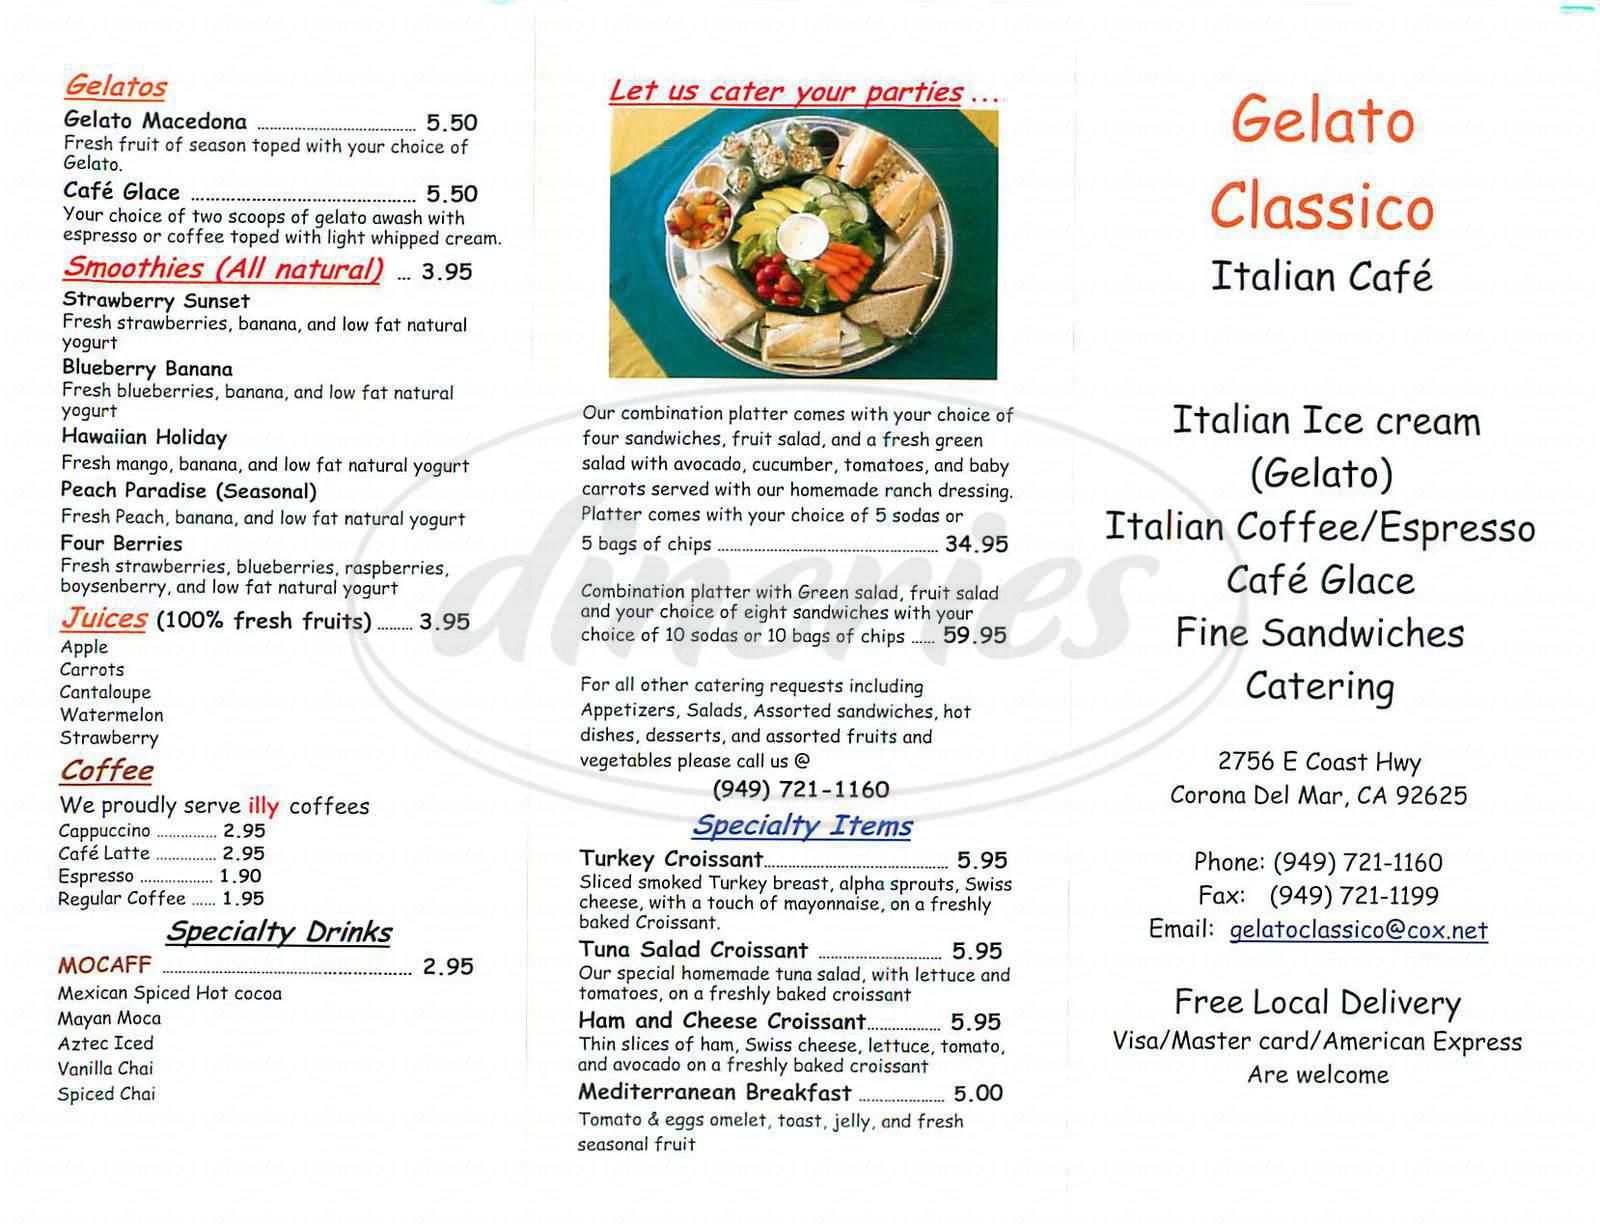 menu for Gelato Classico